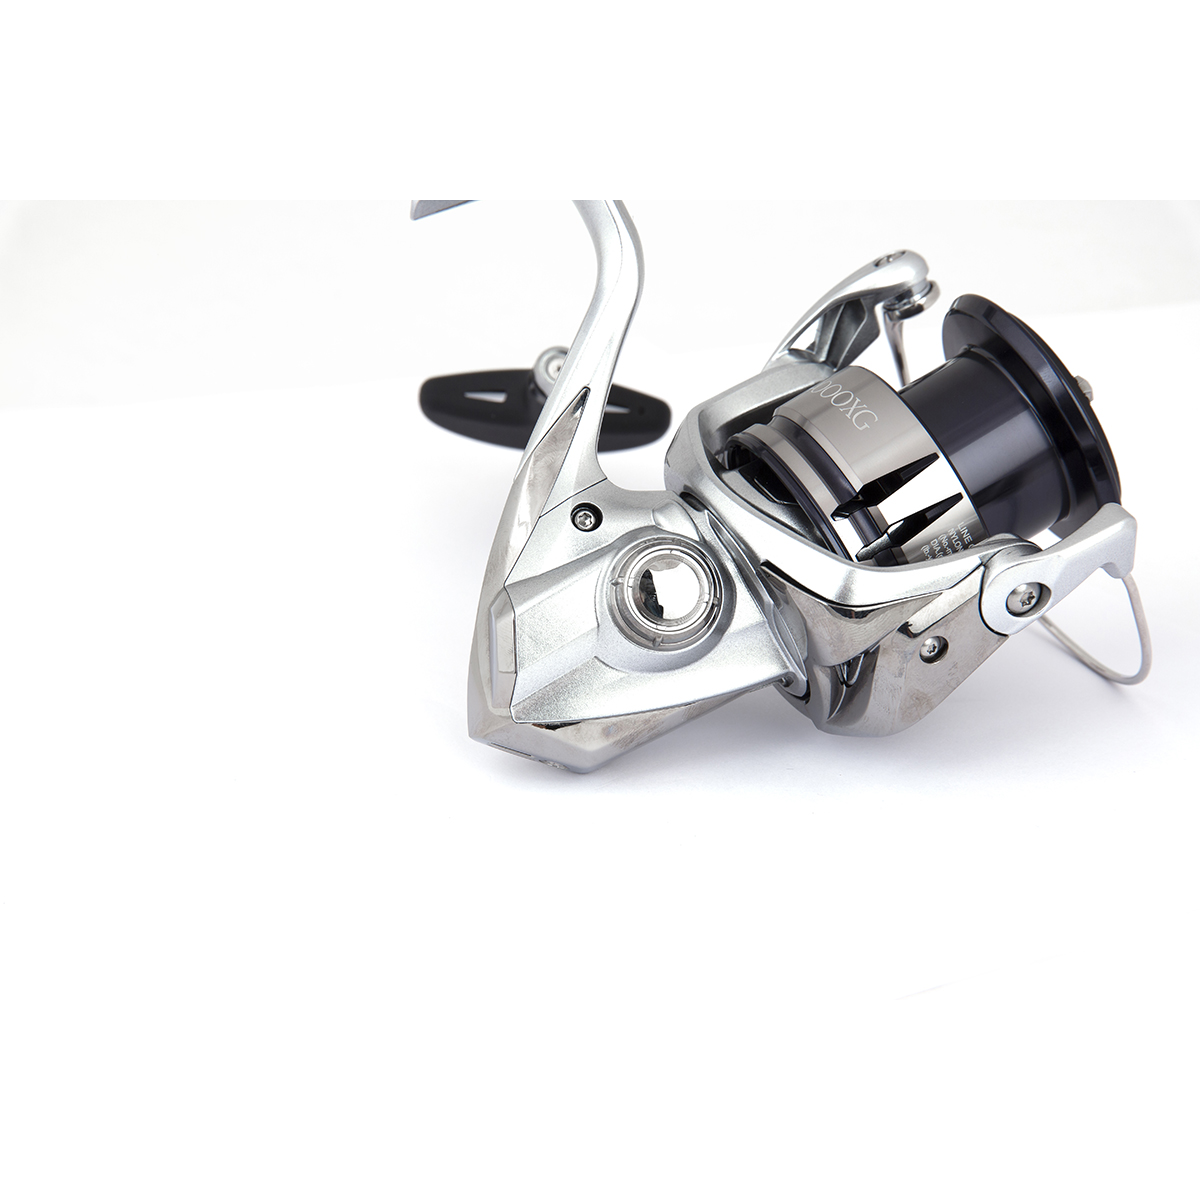 Carreto Shimano Stradic C4000 Xg Fl 0 Pesca Barrento